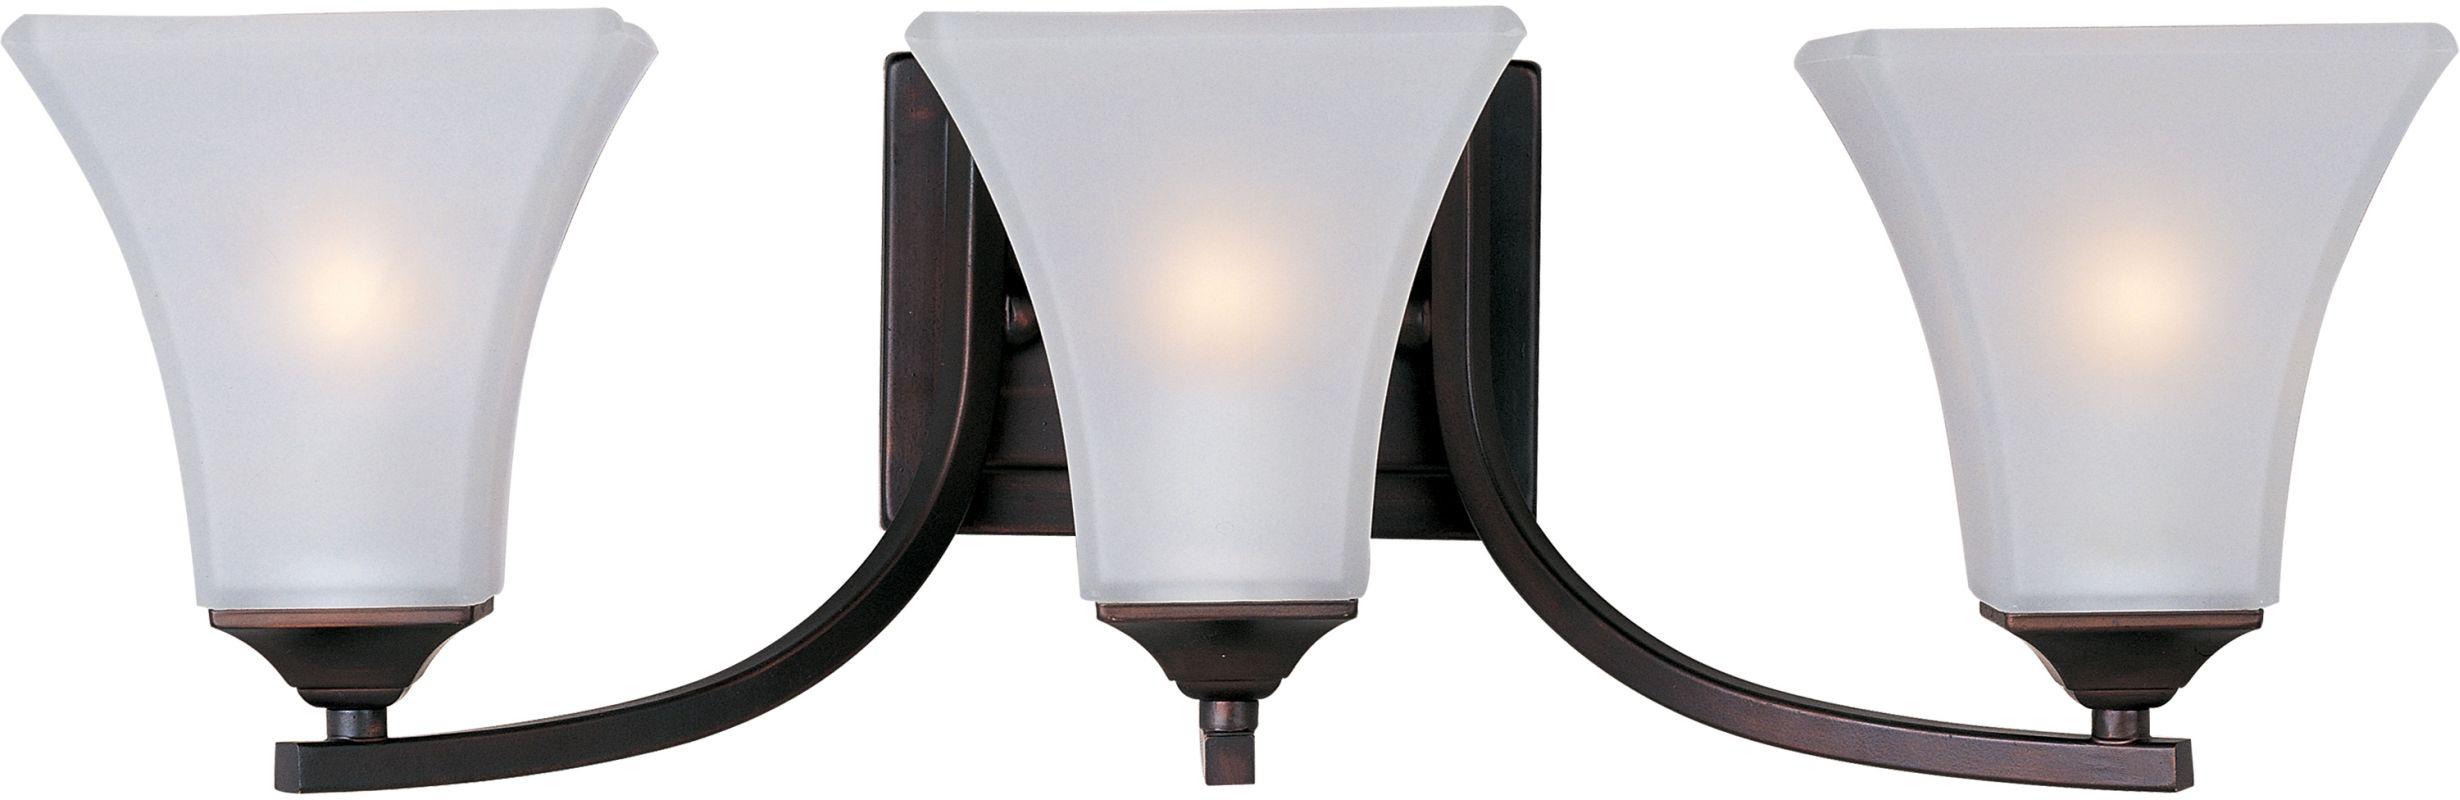 "Delacora DL-44580 3 Light 21.5"" Wide Bathroom Fixture from the Aurora"